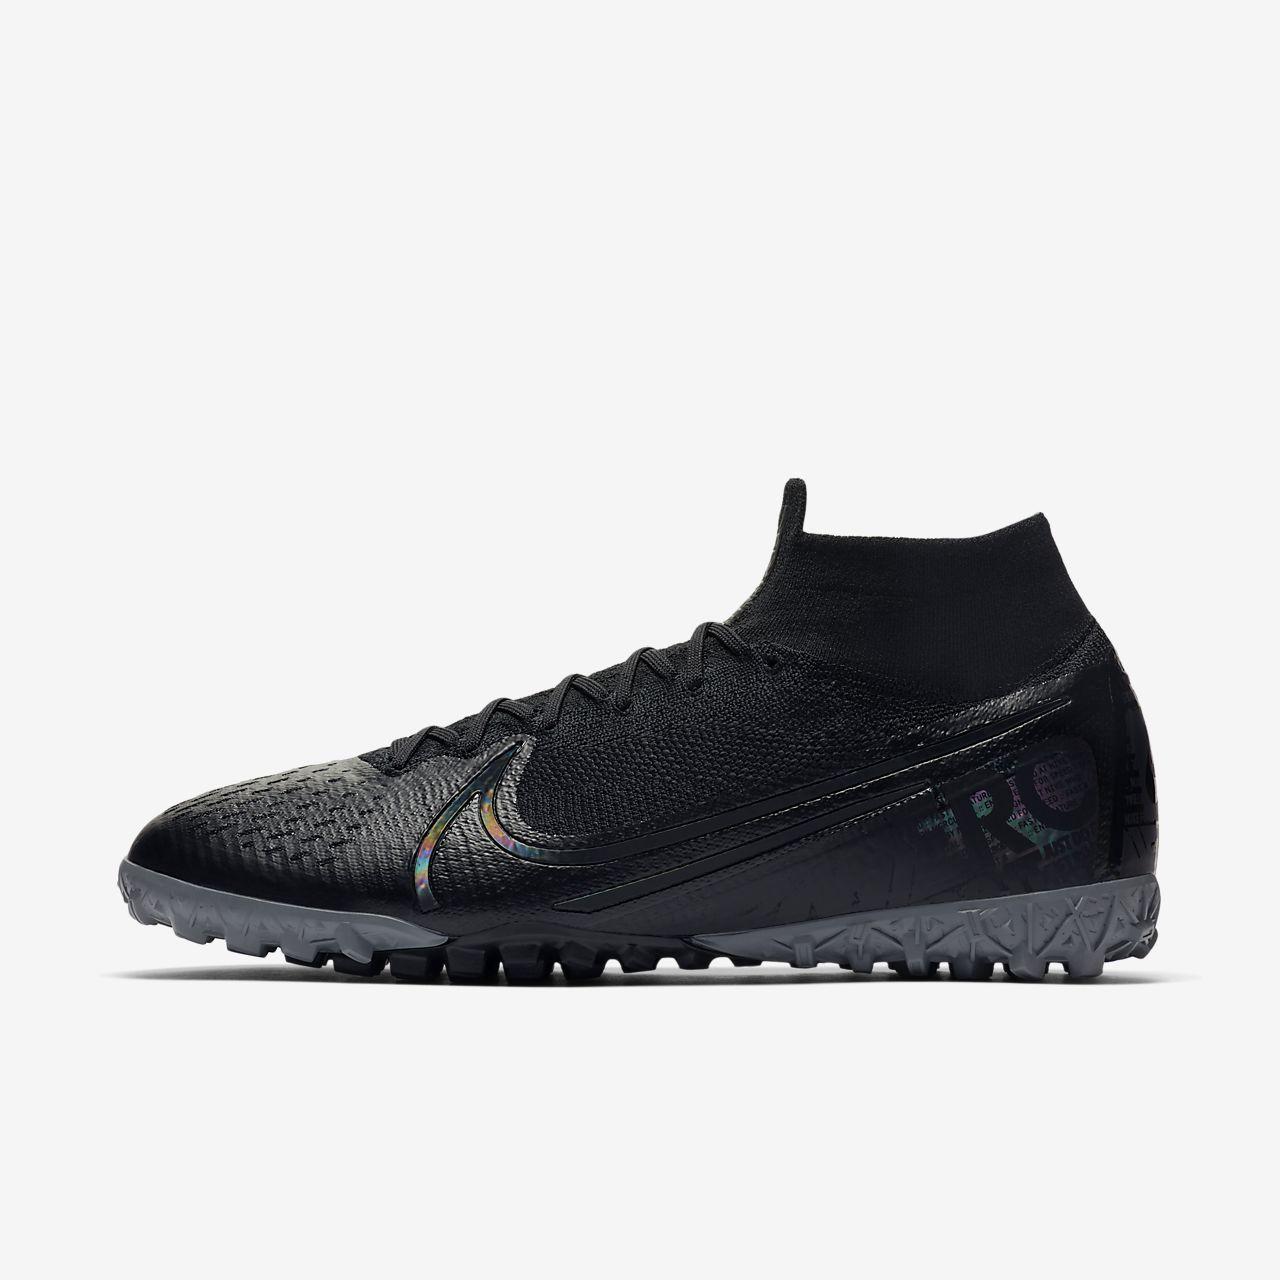 Calzado de fútbol para césped deportivo Nike Mercurial Superfly 7 Elite TF